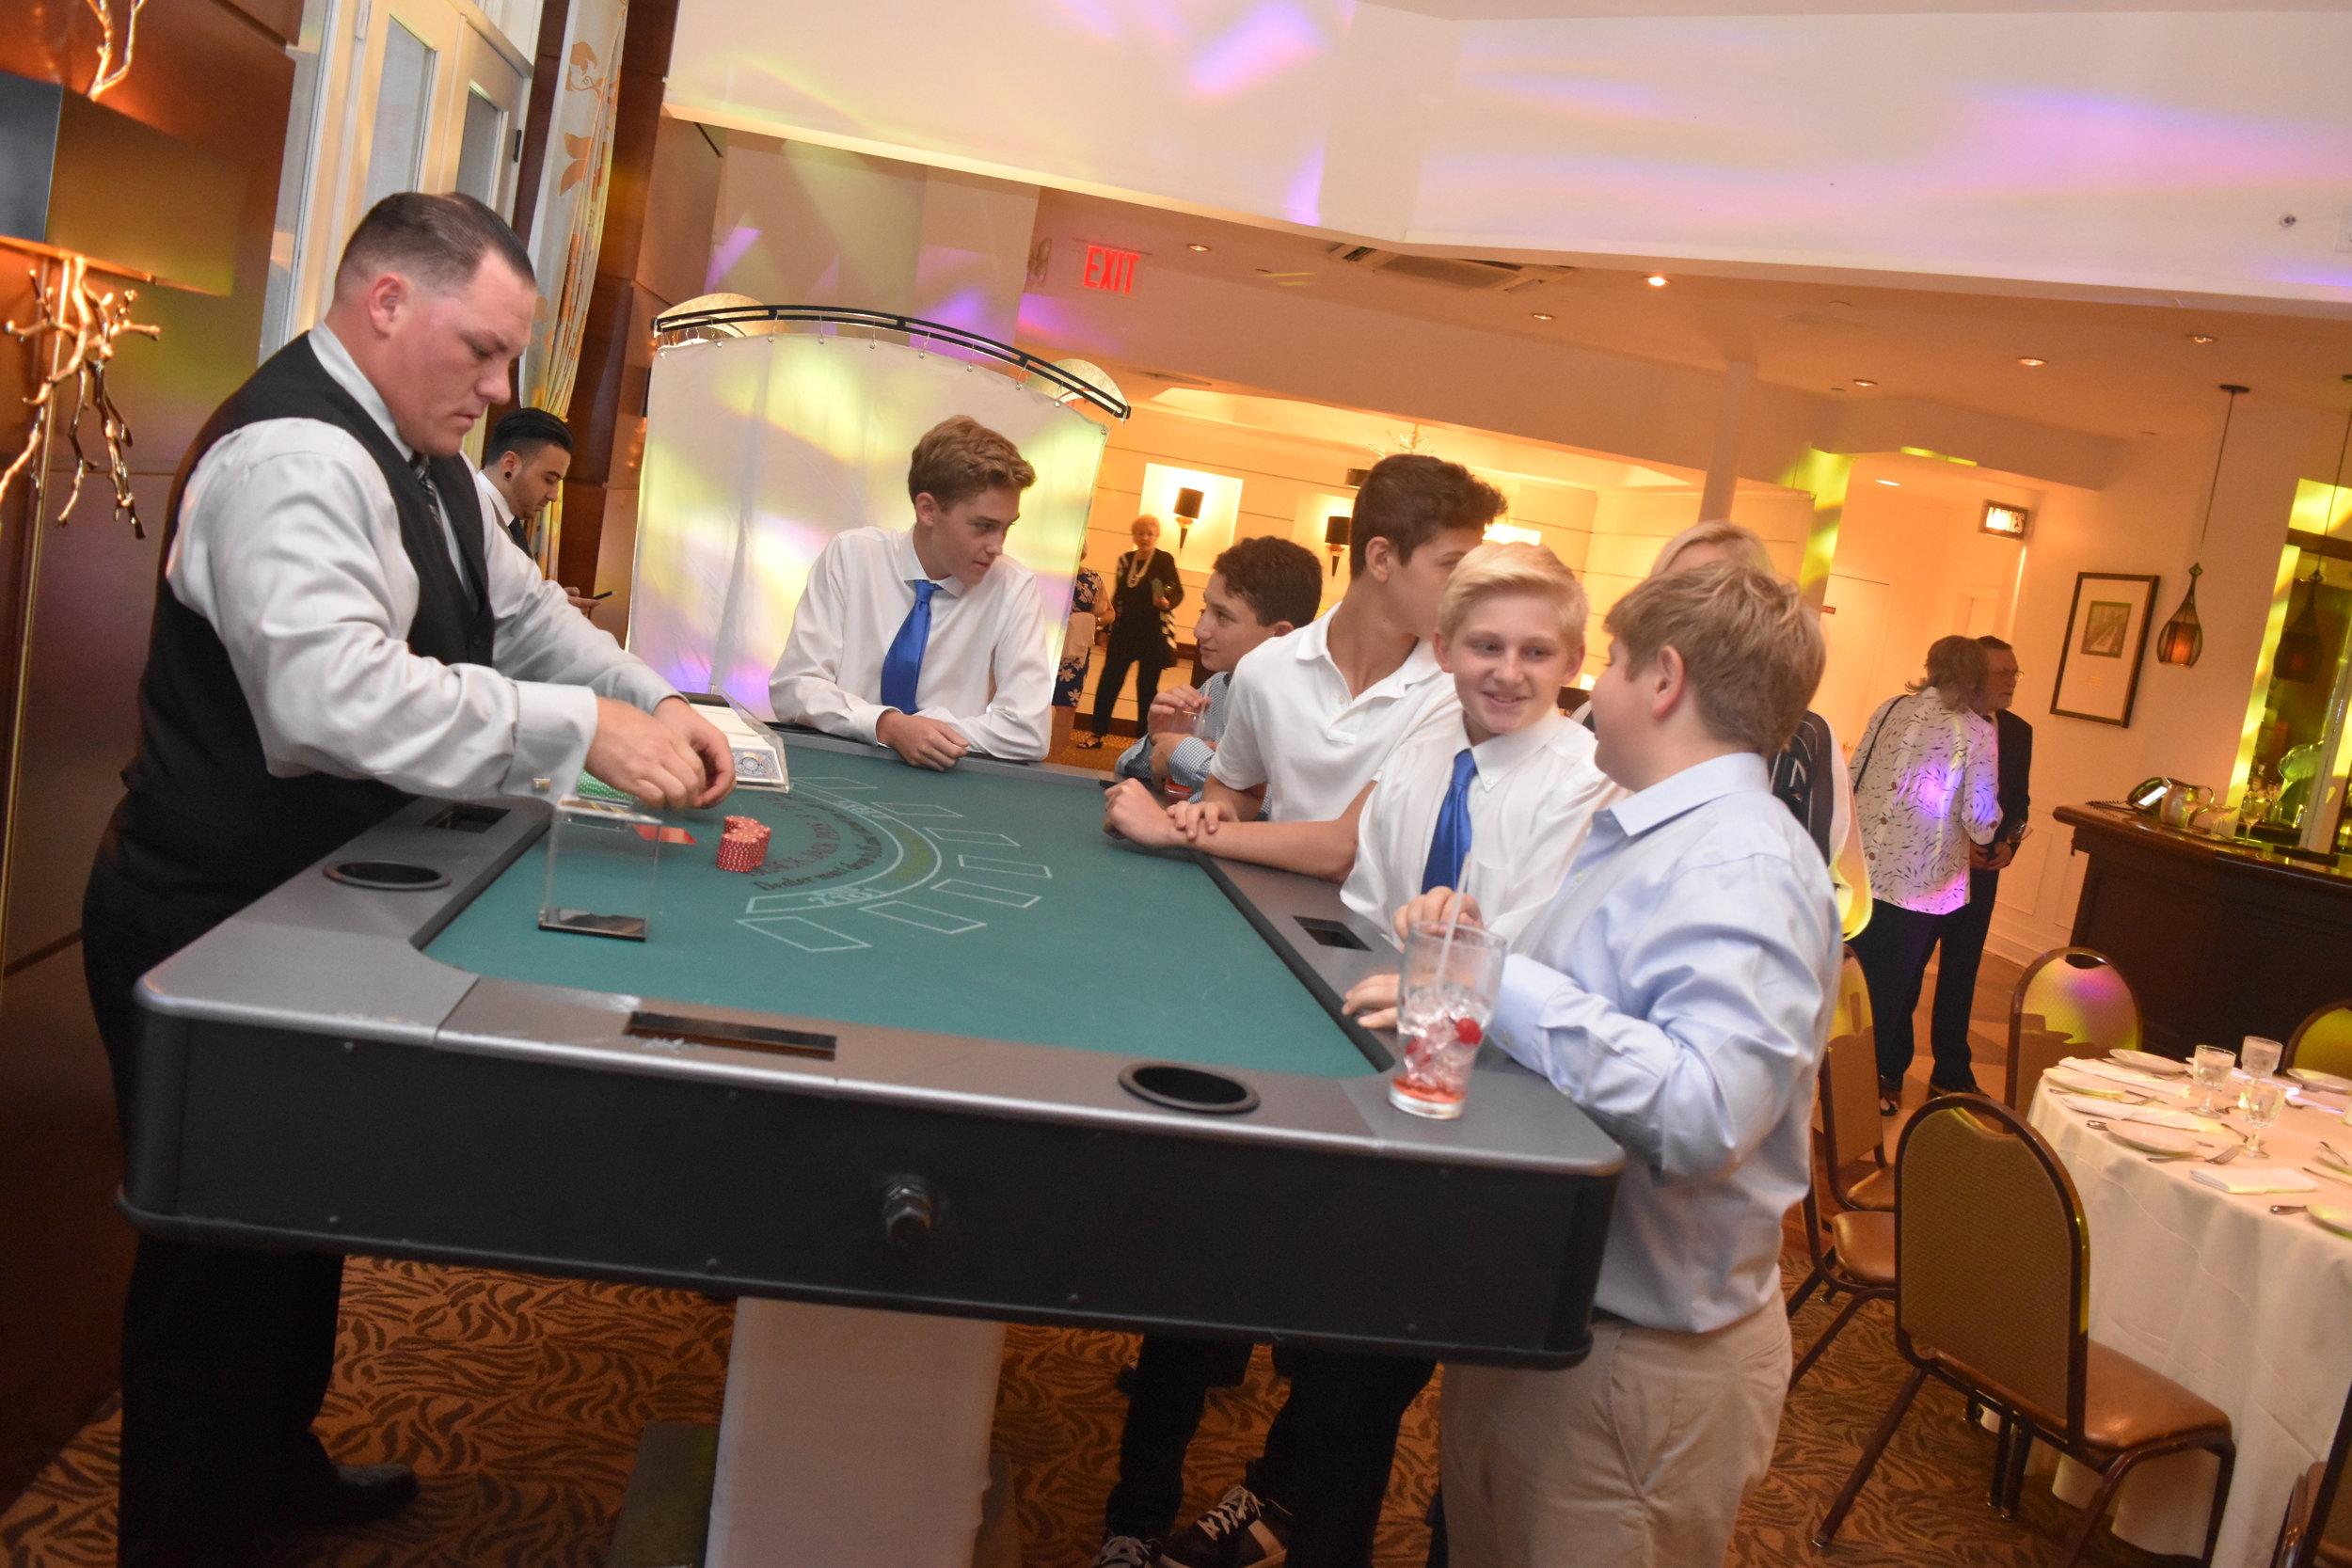 Gaming Tables.JPG